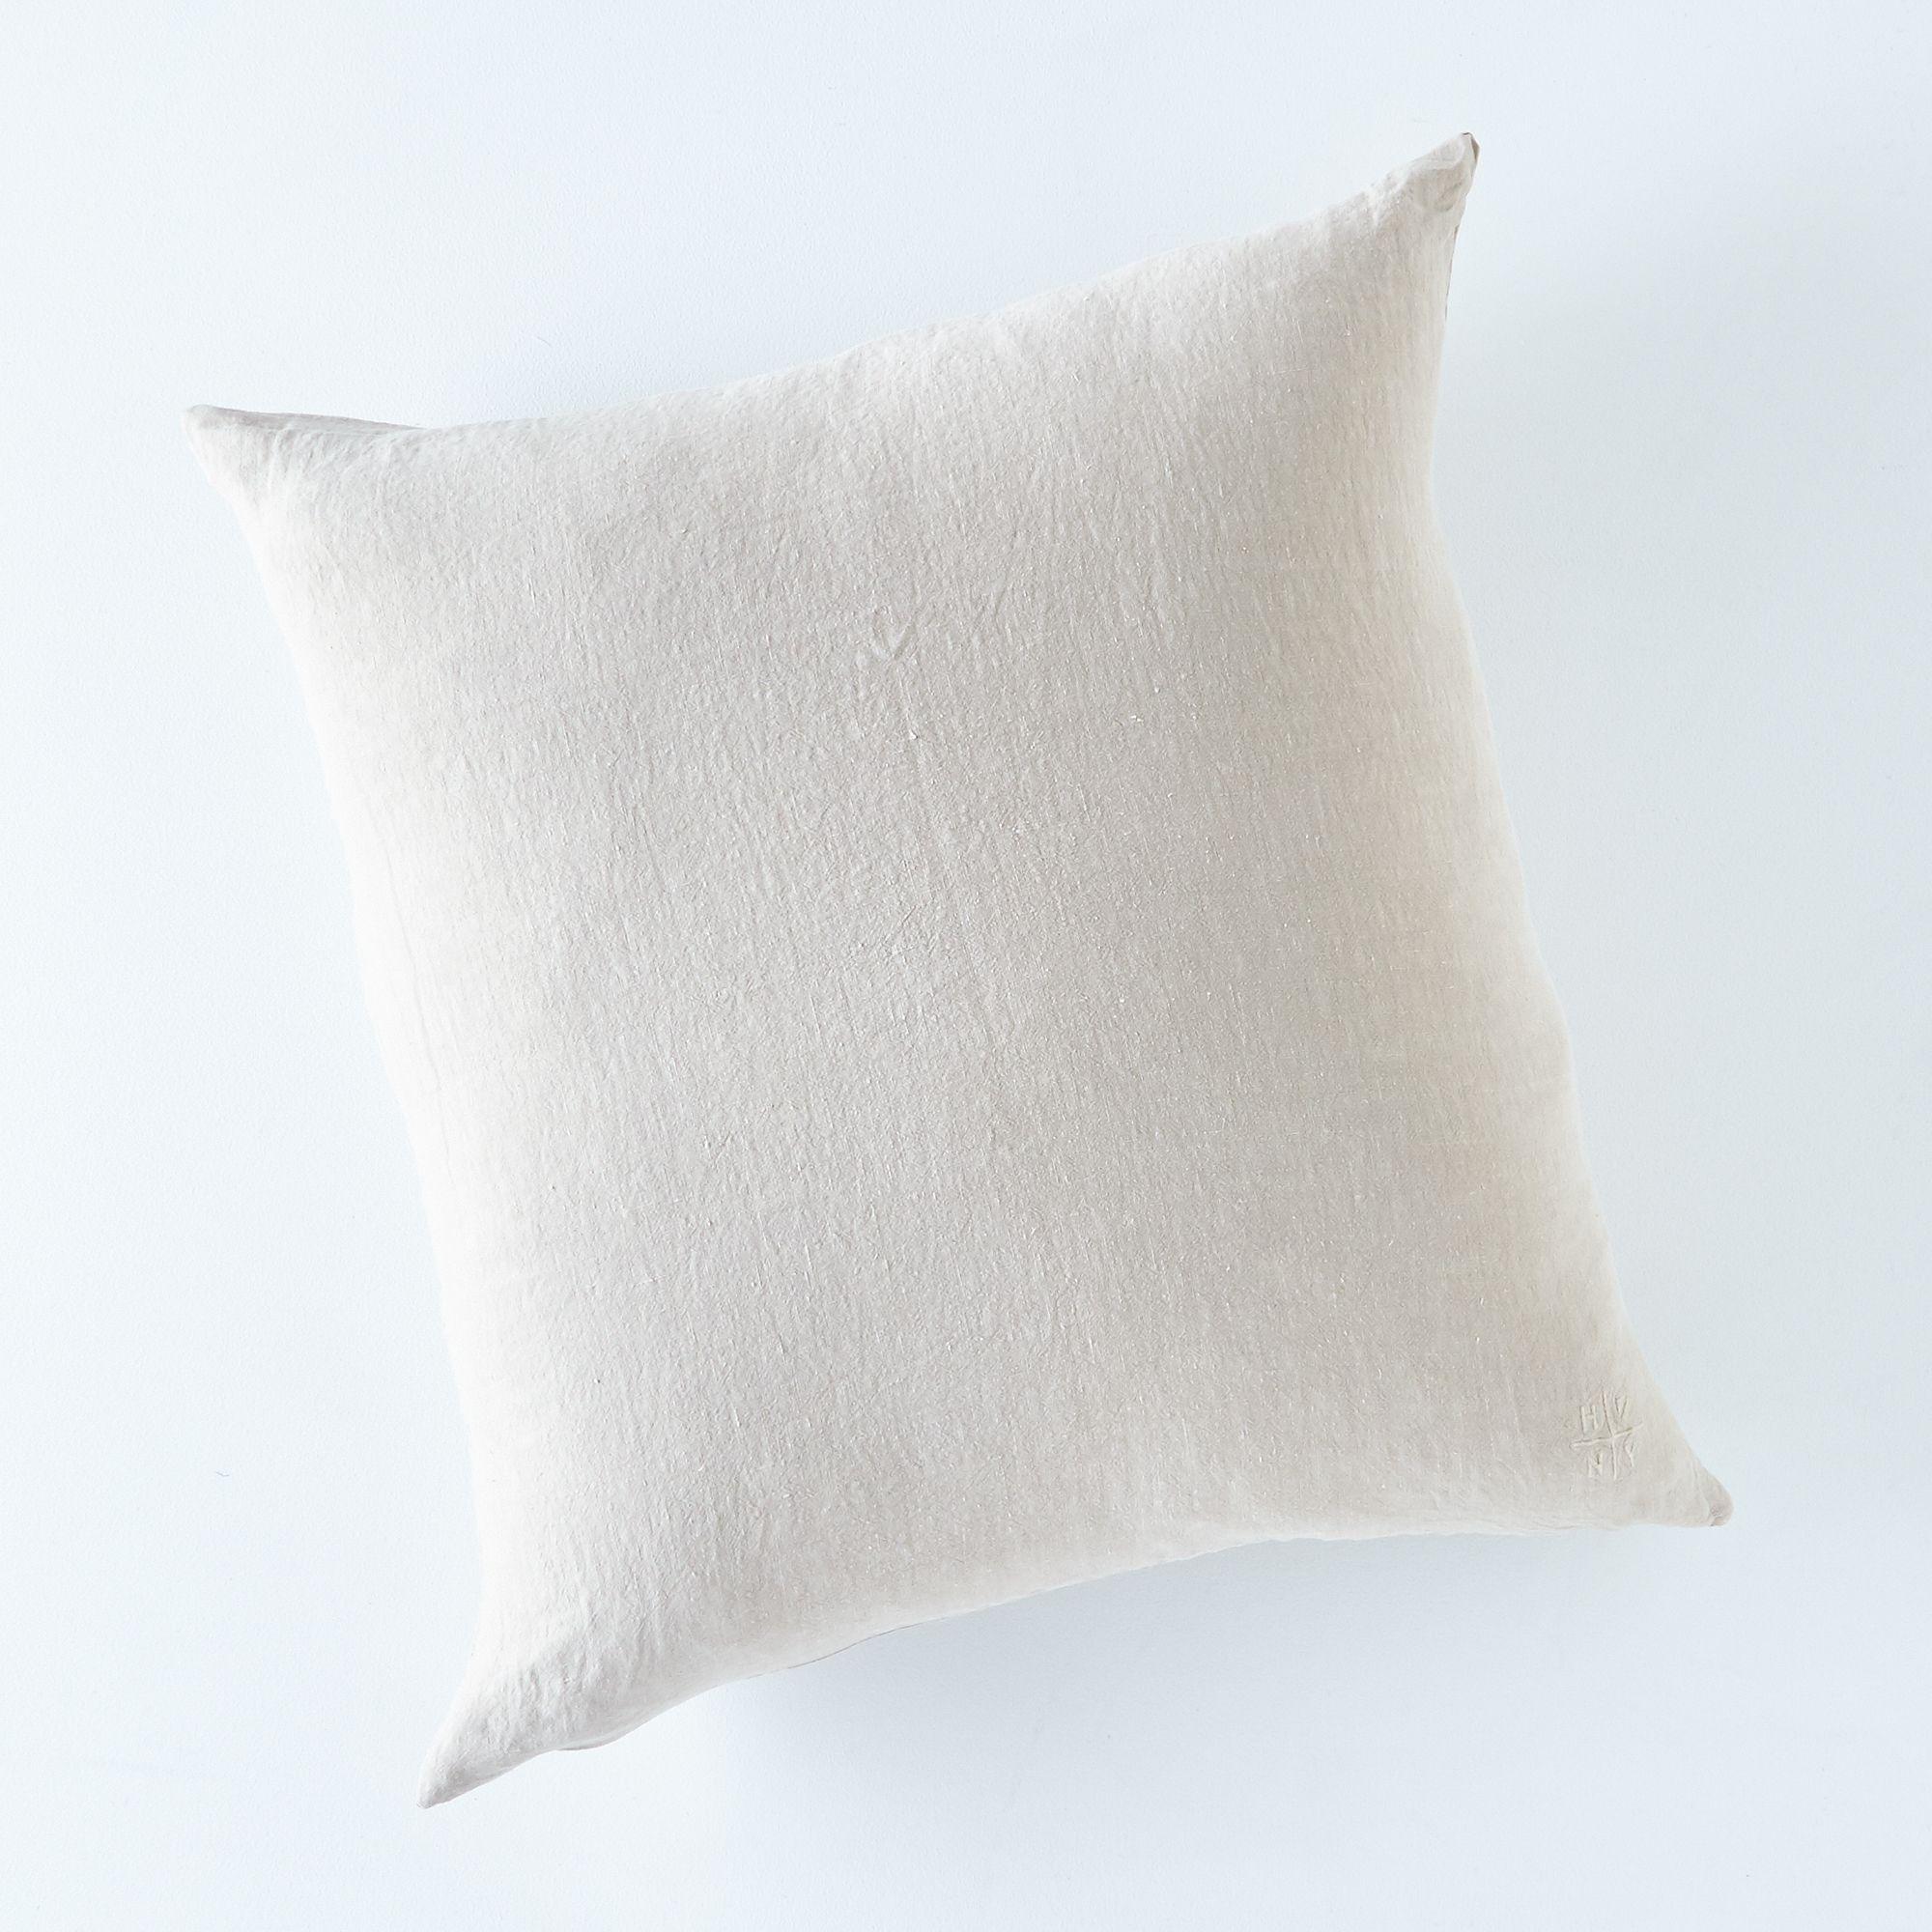 E015abc4 a0f8 11e5 a190 0ef7535729df  2015 0921 hawkins ny stonewashed linen pillow cover 22x22 flax rocky luten 002